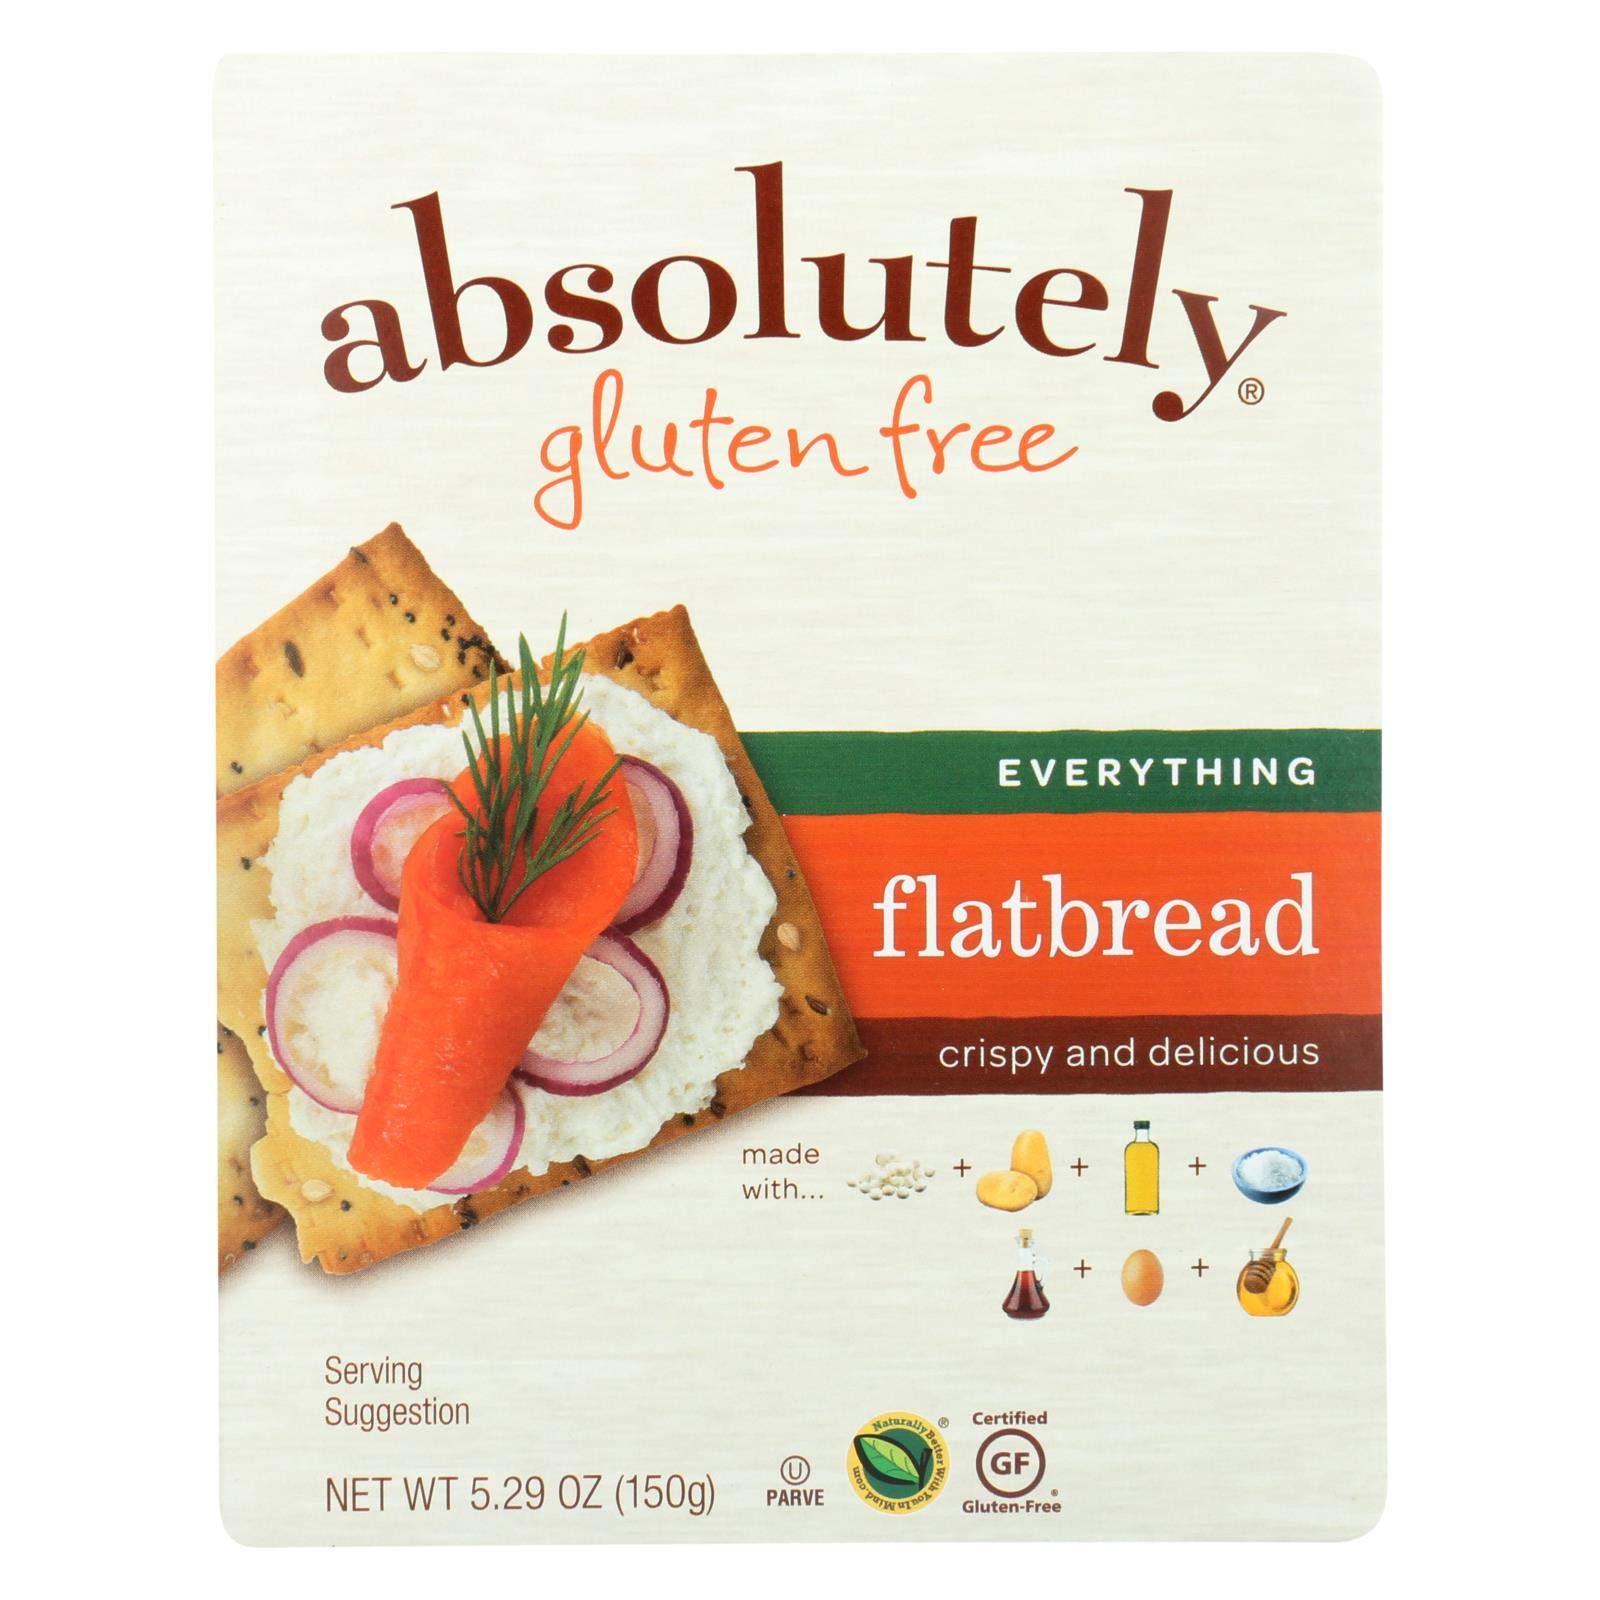 Absolutely Gluten Free Flatbread - Original - Case of 12 - 5.29 oz.